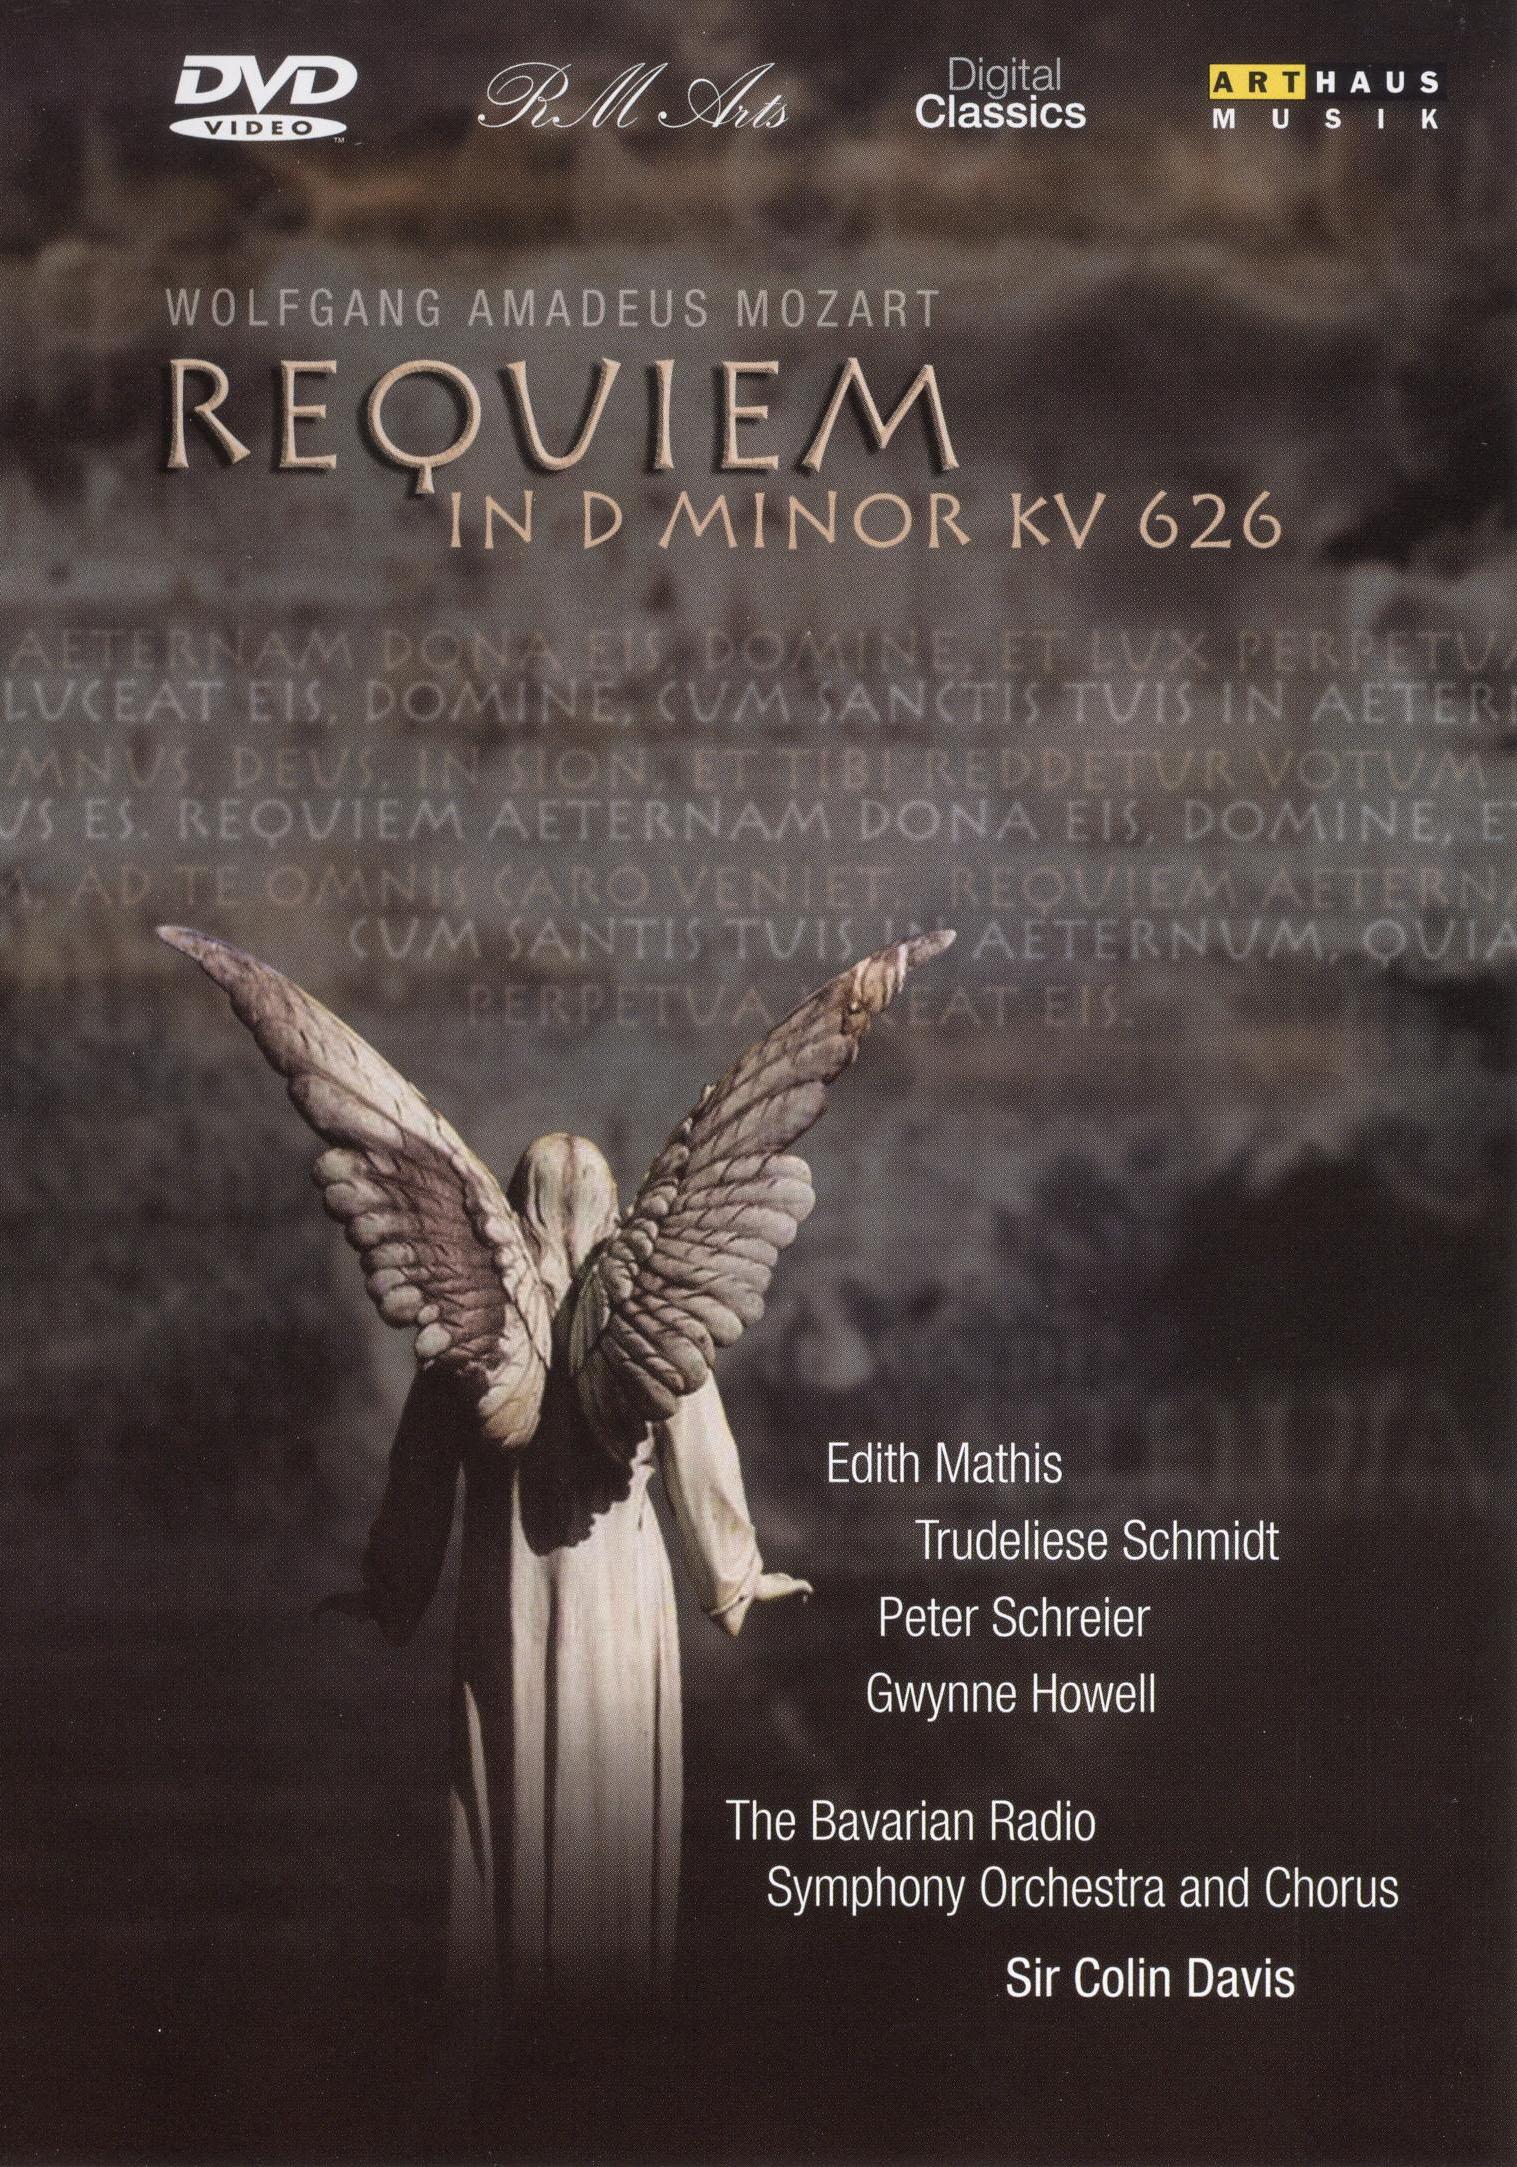 The Bavarian Radio Symphony Orchestra and Chorus/Sir Colin Davis: Mozart - Requiem